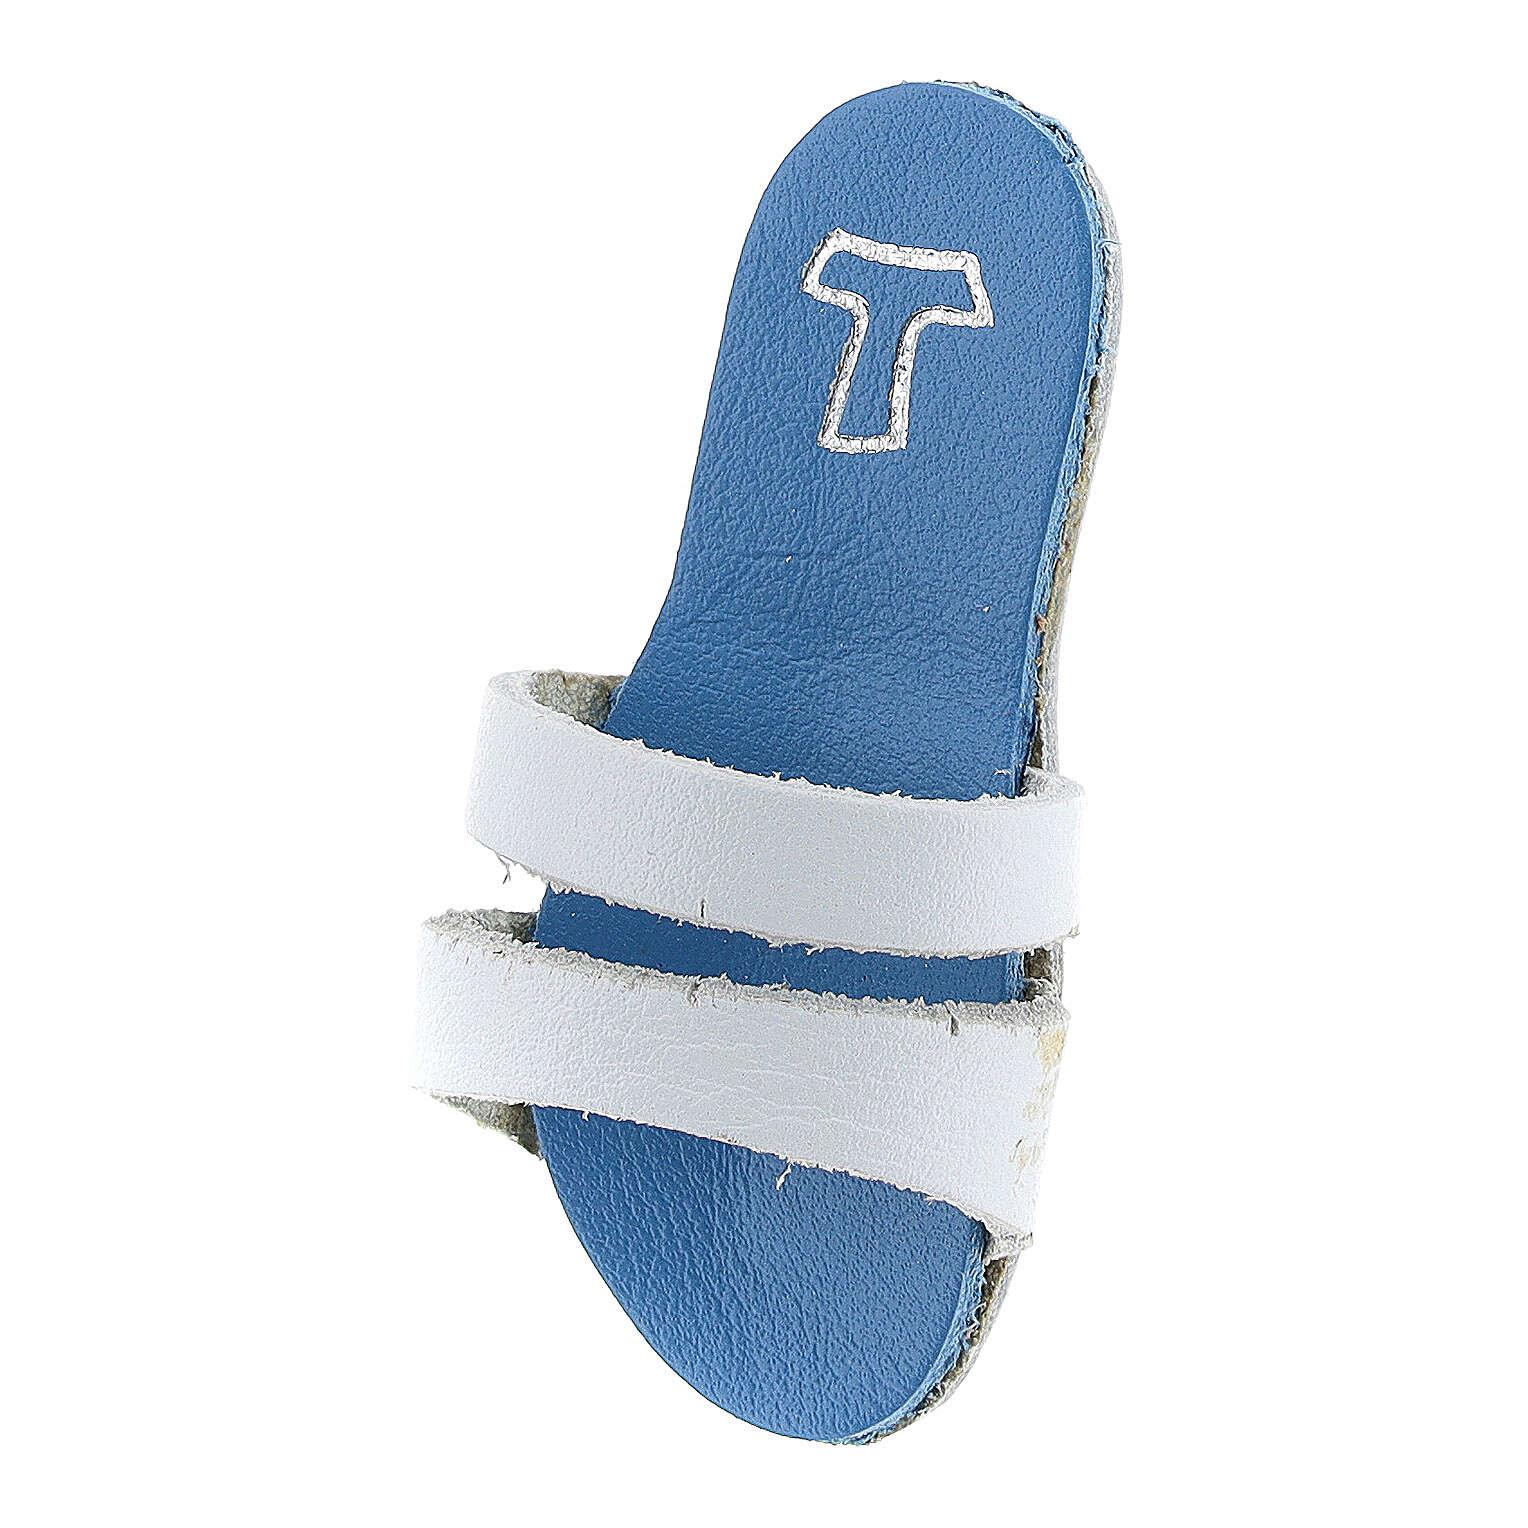 Calamita ciabatta frate azzurra Tau vera pelle 6 cm 3